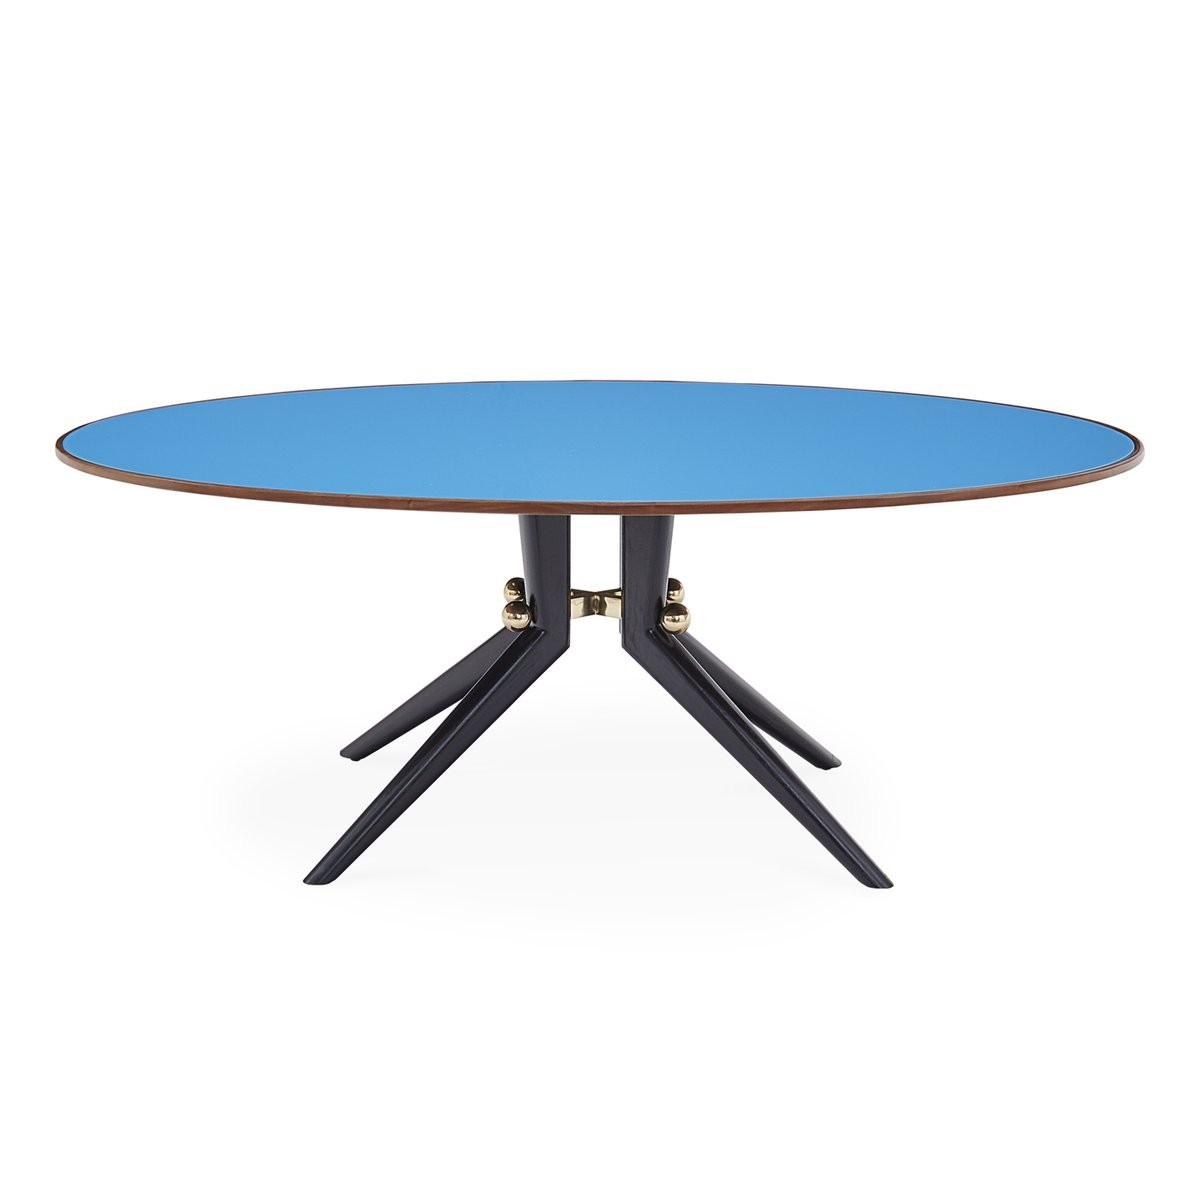 Jonathan Adler I Trocadero Dining Table